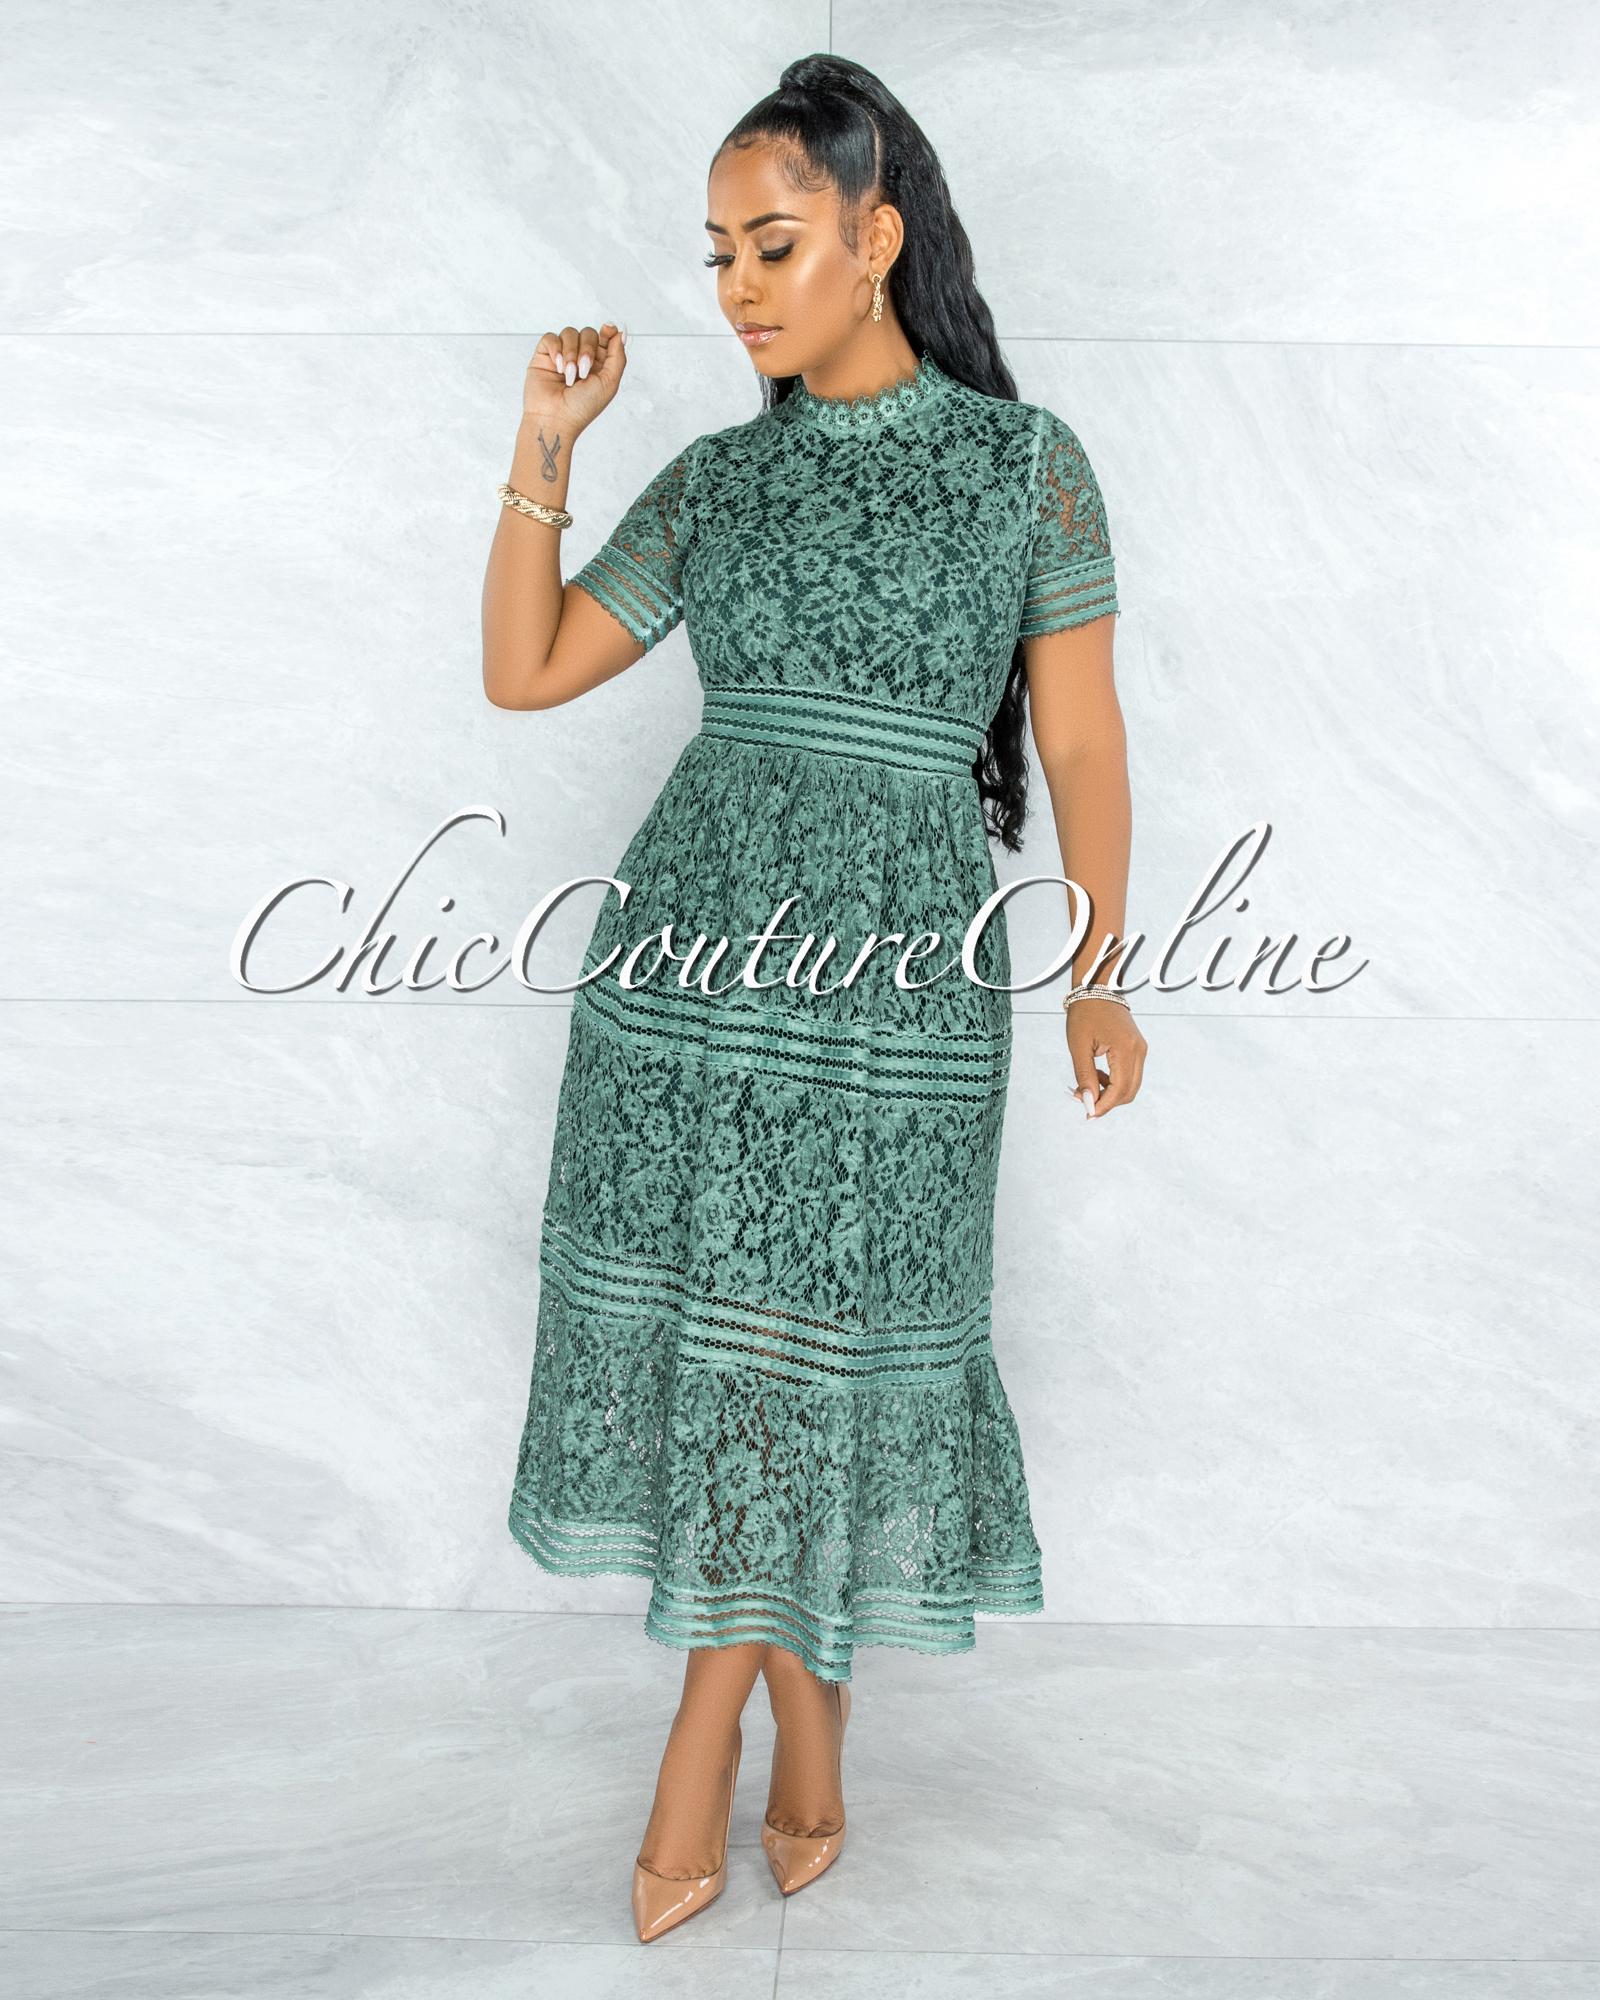 Feather Sage Green Lace Midi Dress